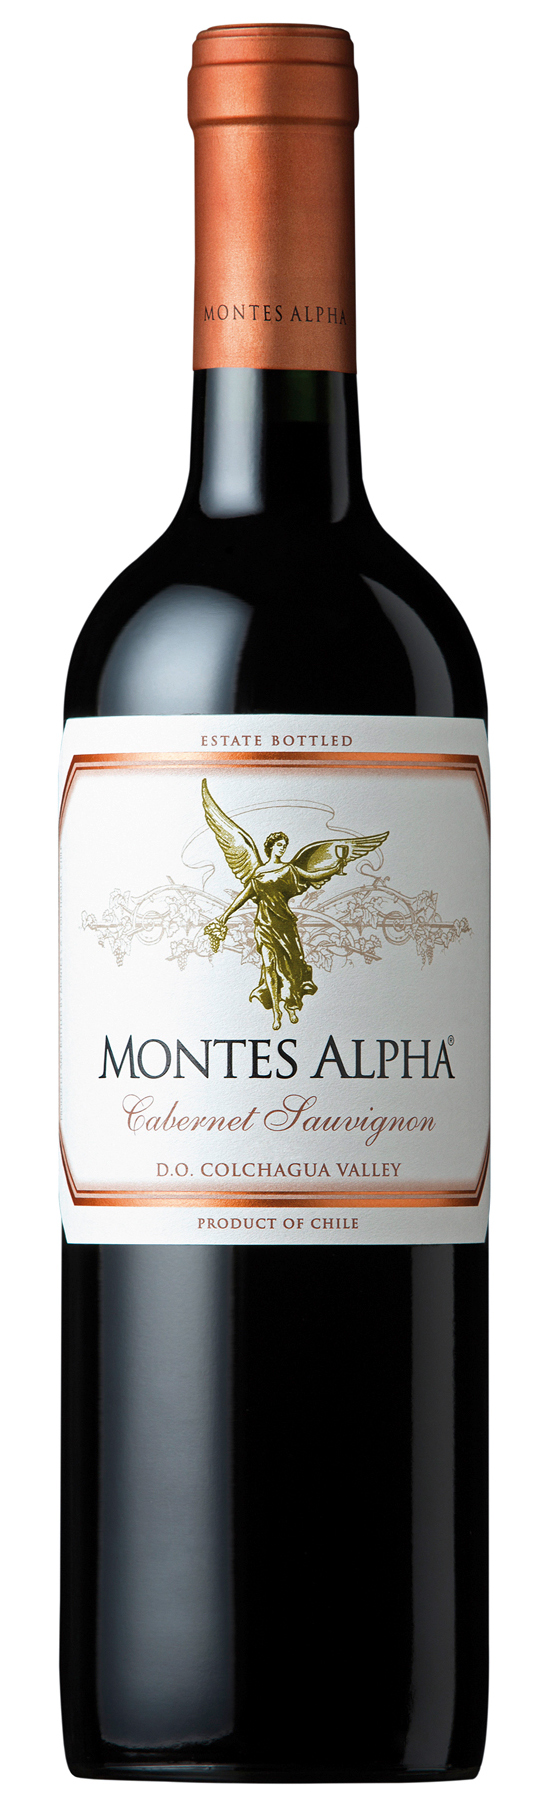 2014 Montes Alpha Cabernet Sauvignon